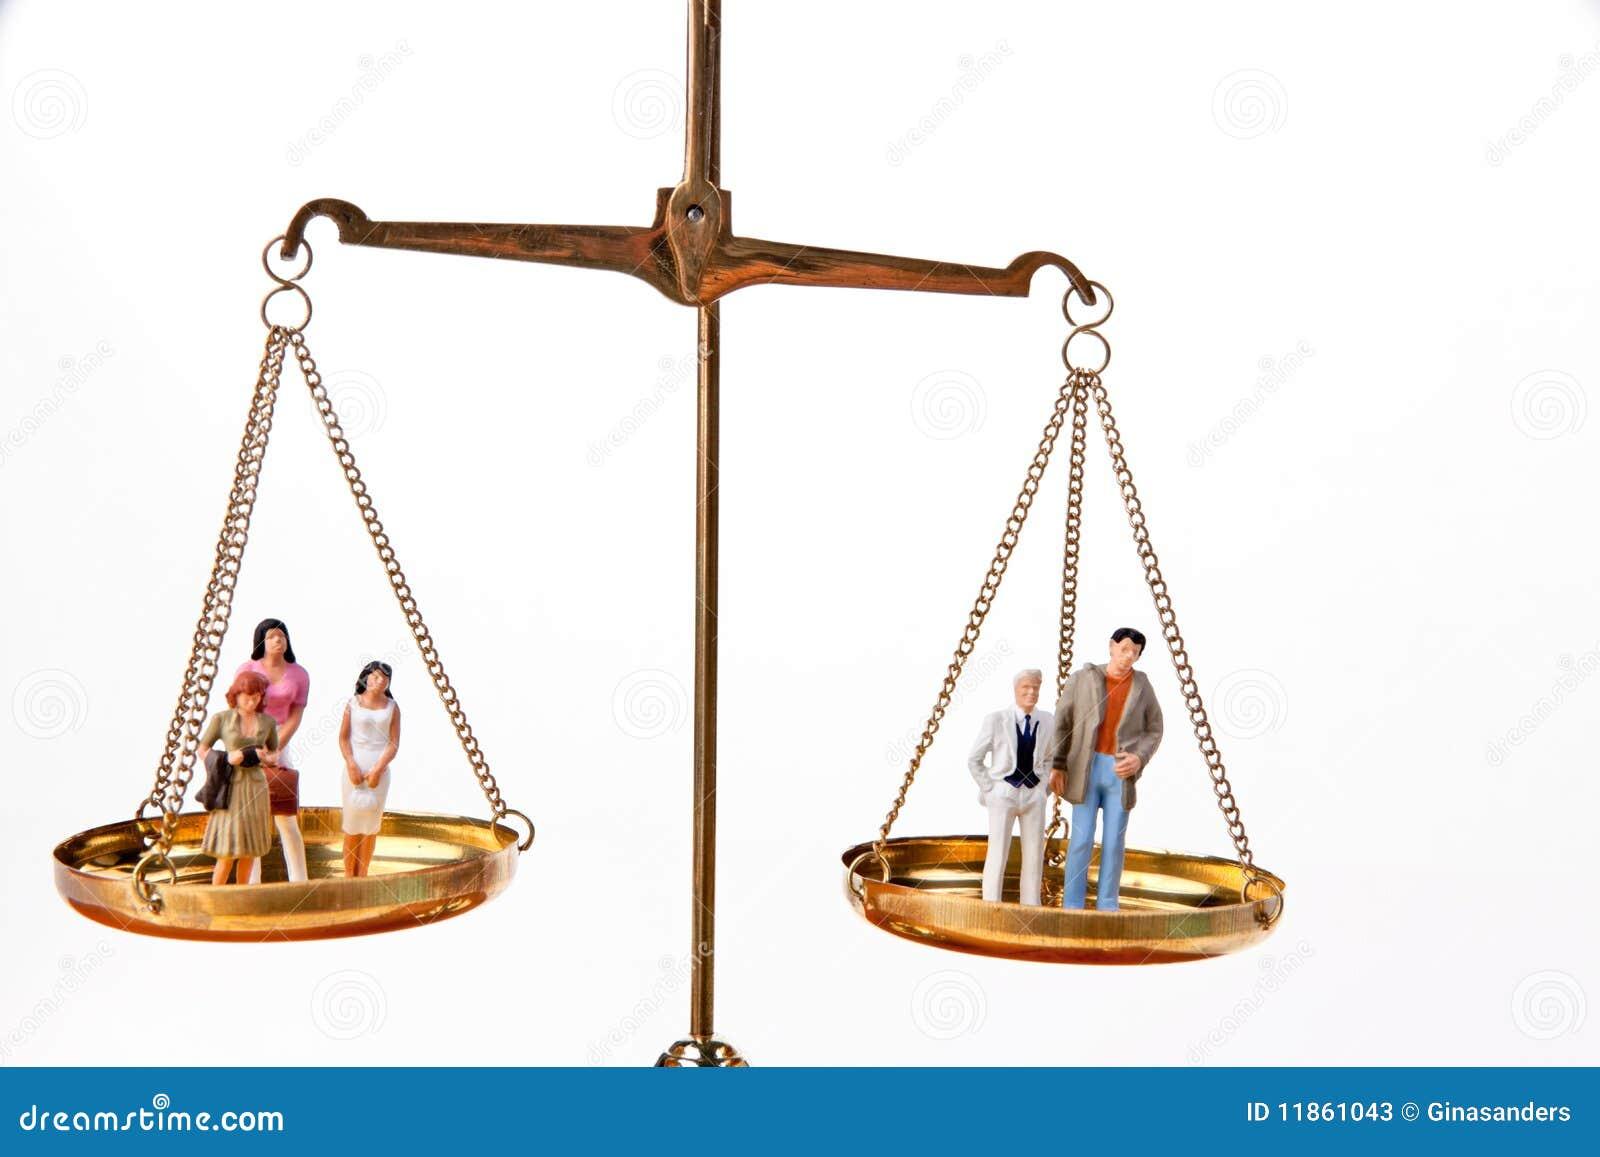 Dolls On Balancing Scales Stock Photos Image 11861043